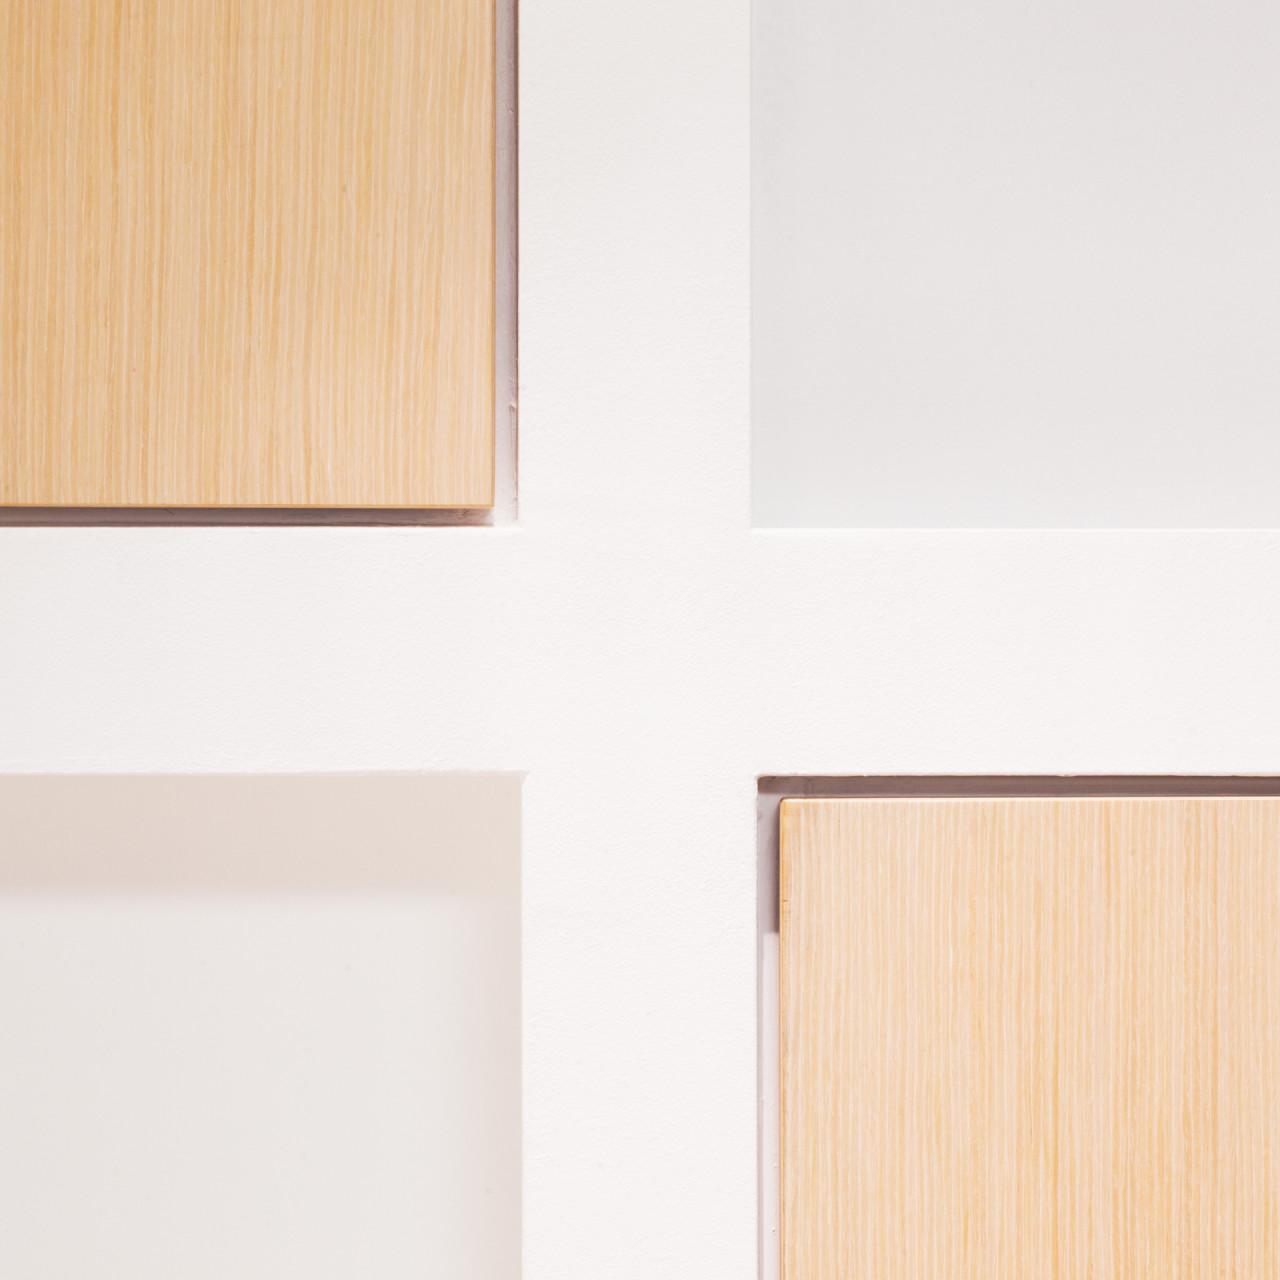 Wisp-Architects- Oxilia Apartment 13